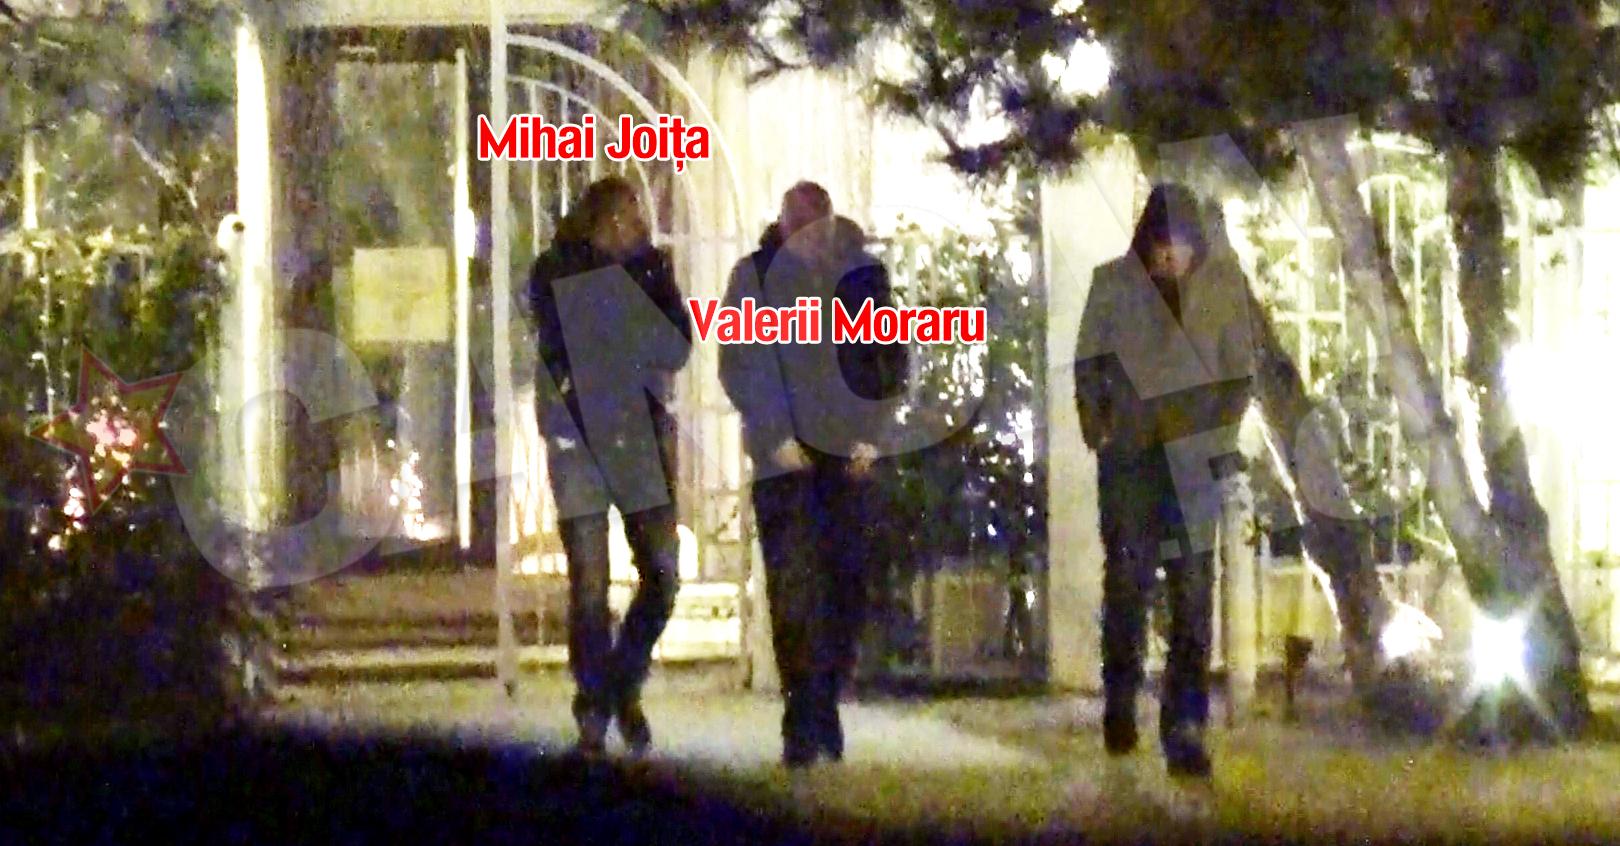 La scurt timp, Moraru si Joita au iesit din restaurant